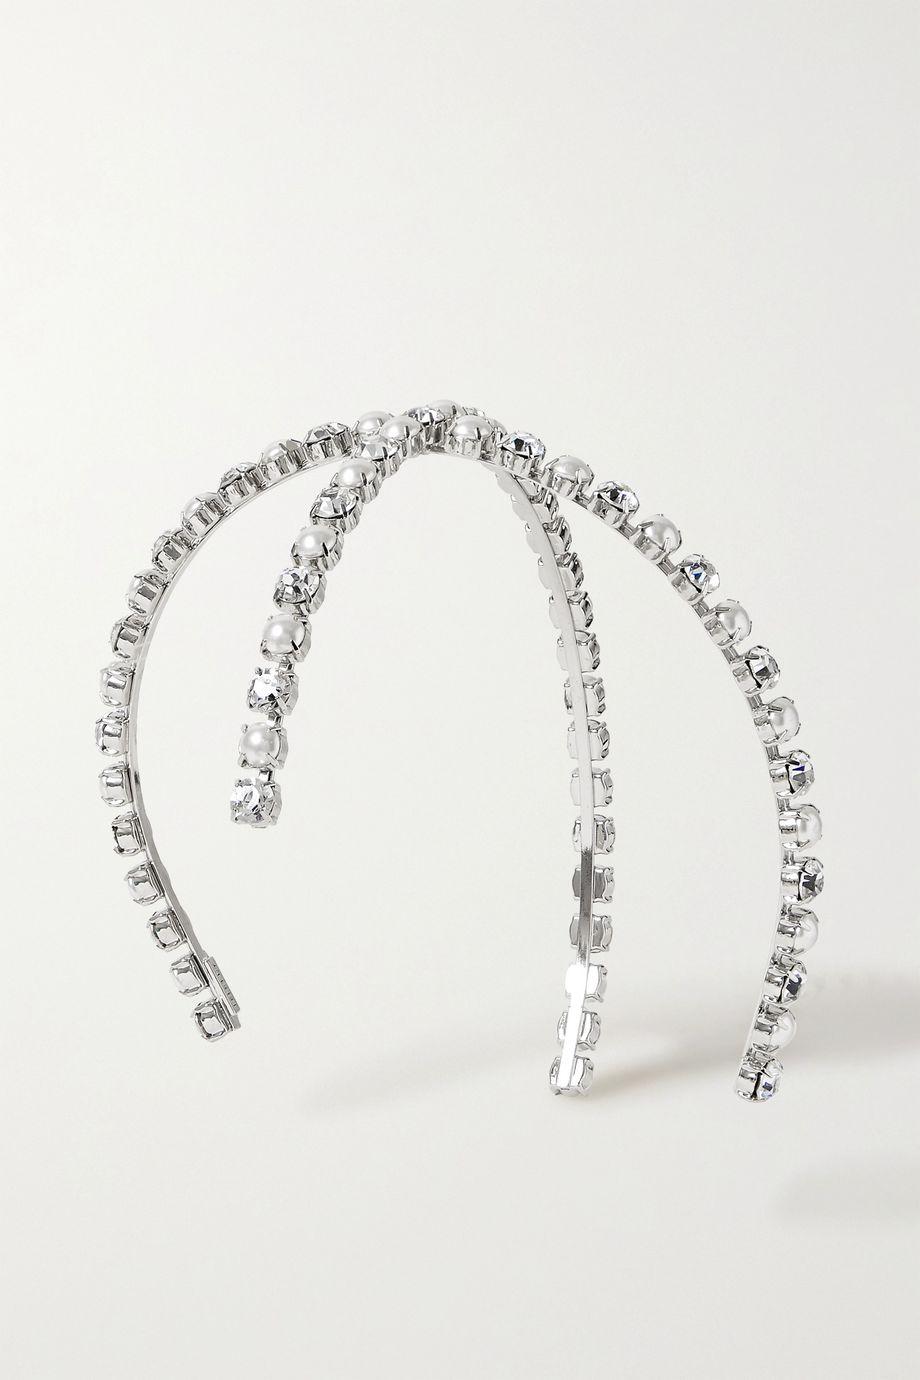 LELET NY 人造珍珠、施华洛世奇水晶、银色发箍